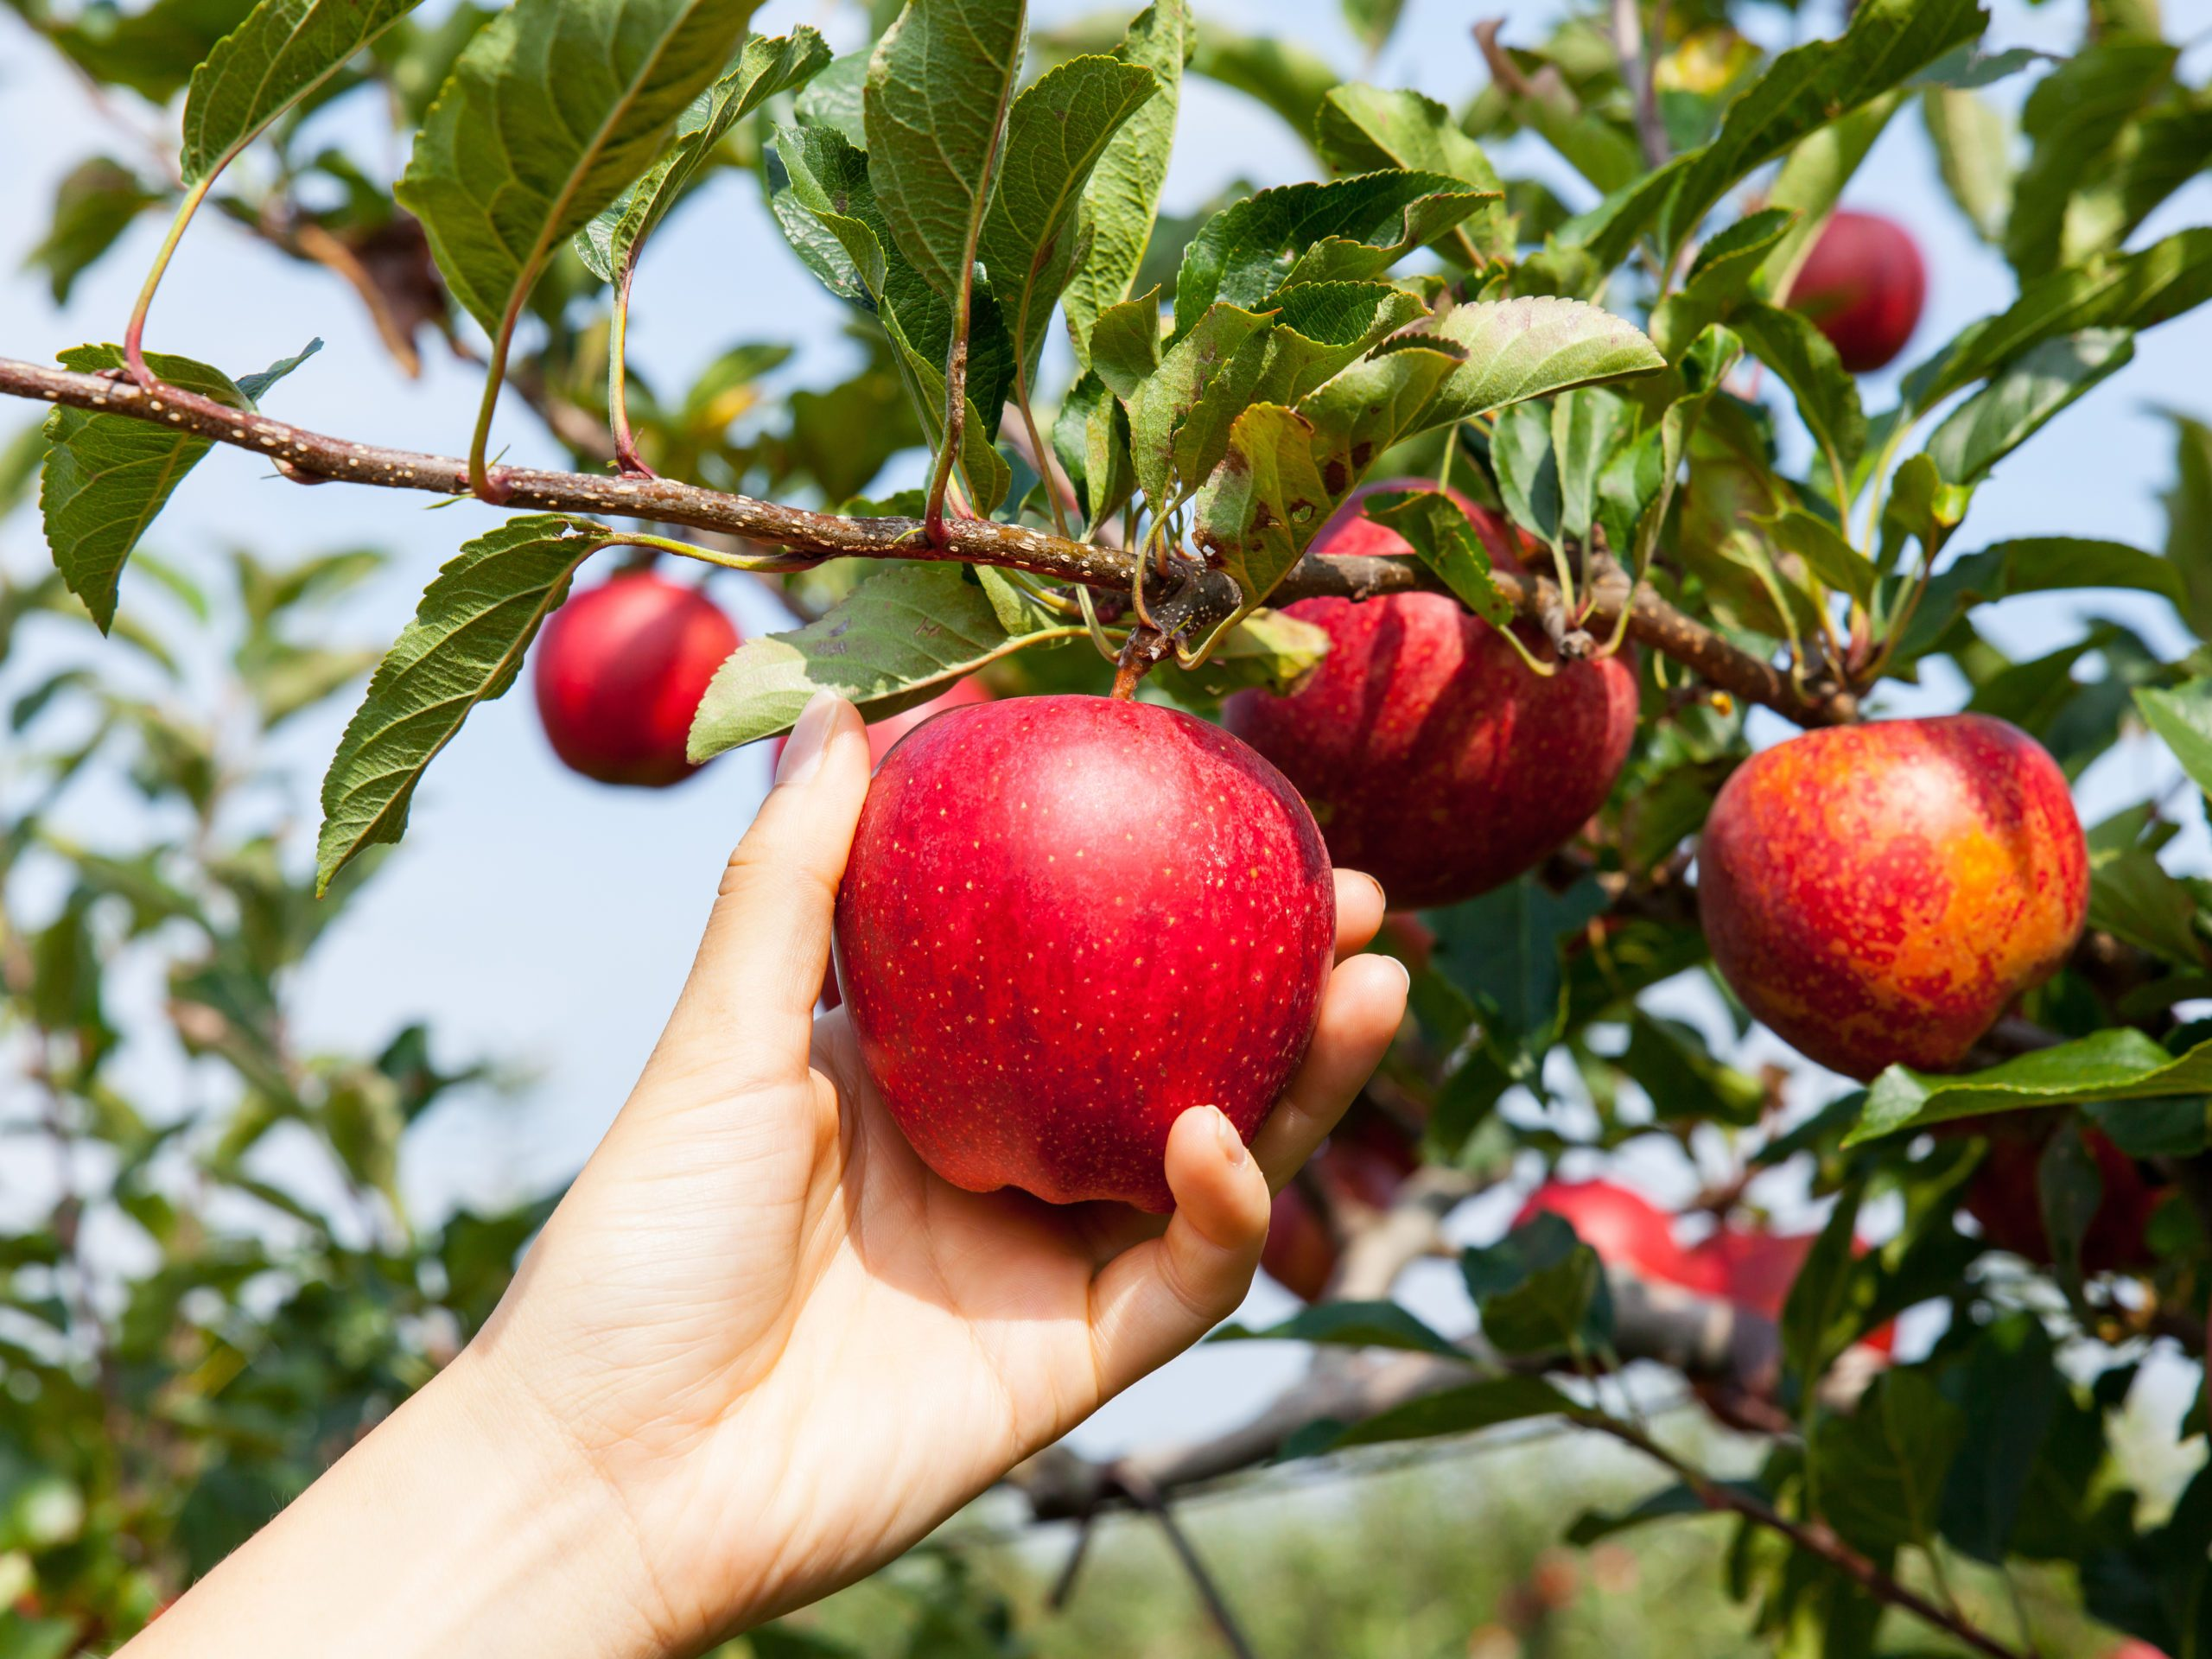 Apple benefits - picking apples